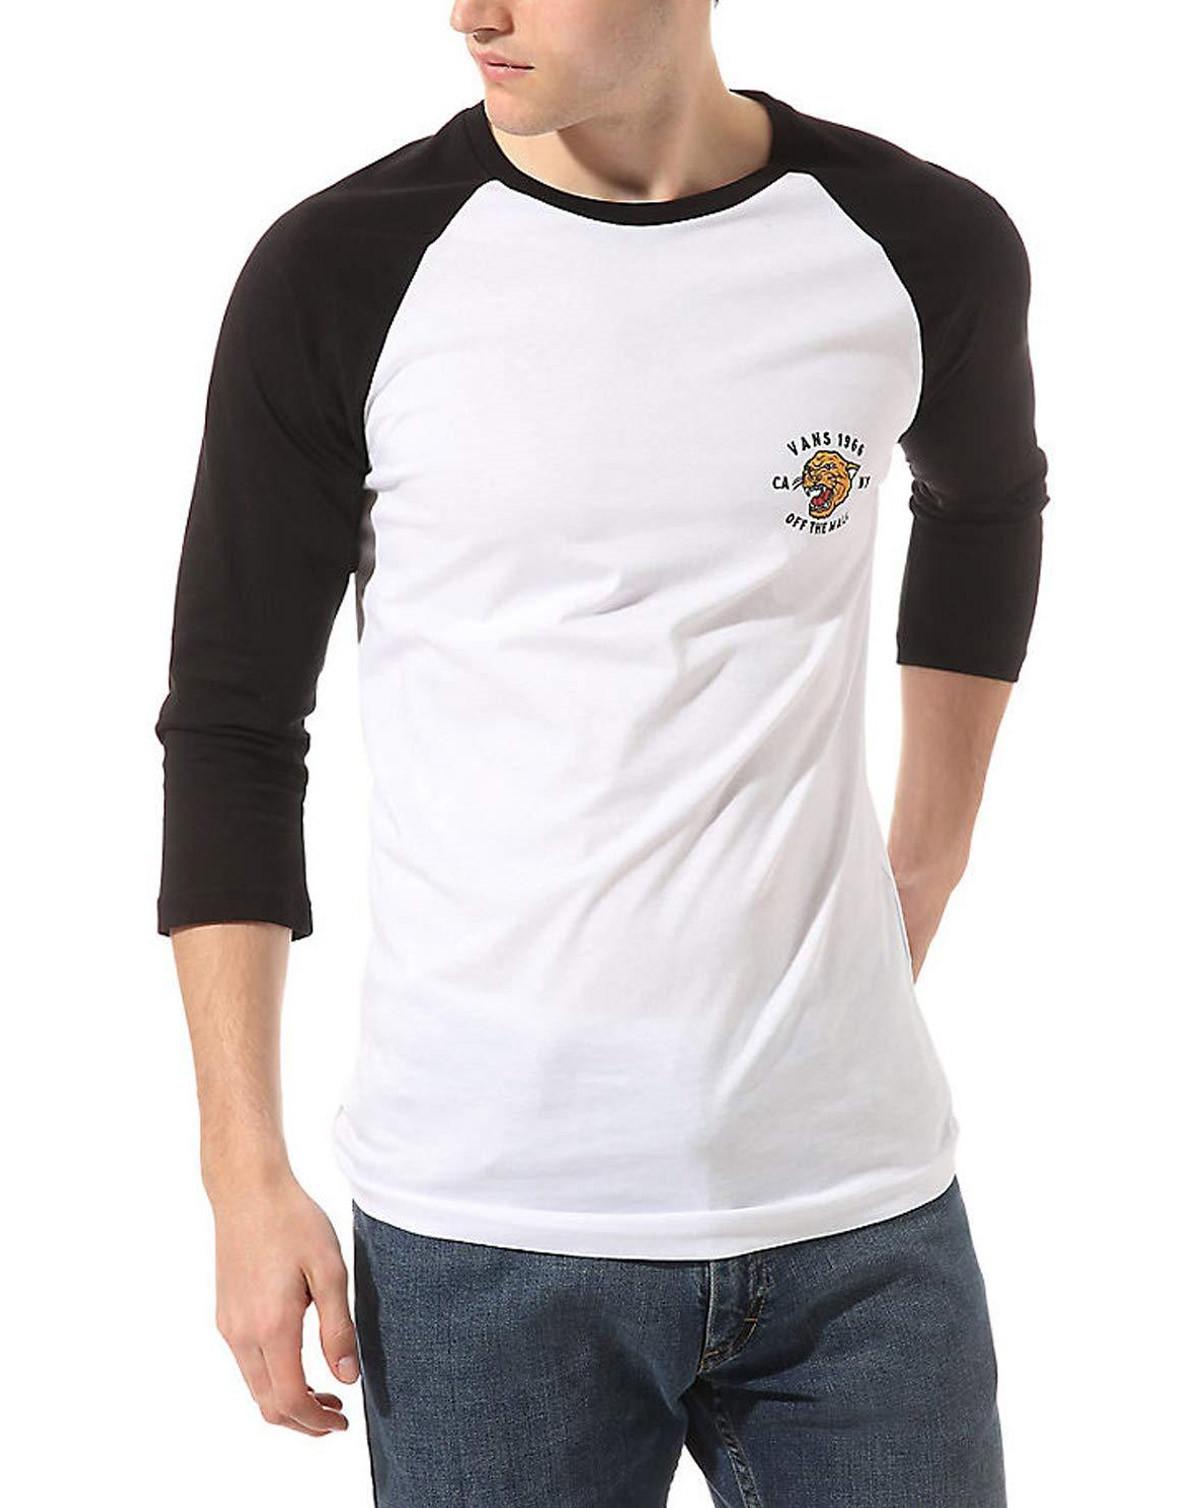 VANS Mn Growler Raglan 3/4 Sleeve T-Shirt (Hvid / Sort, S)